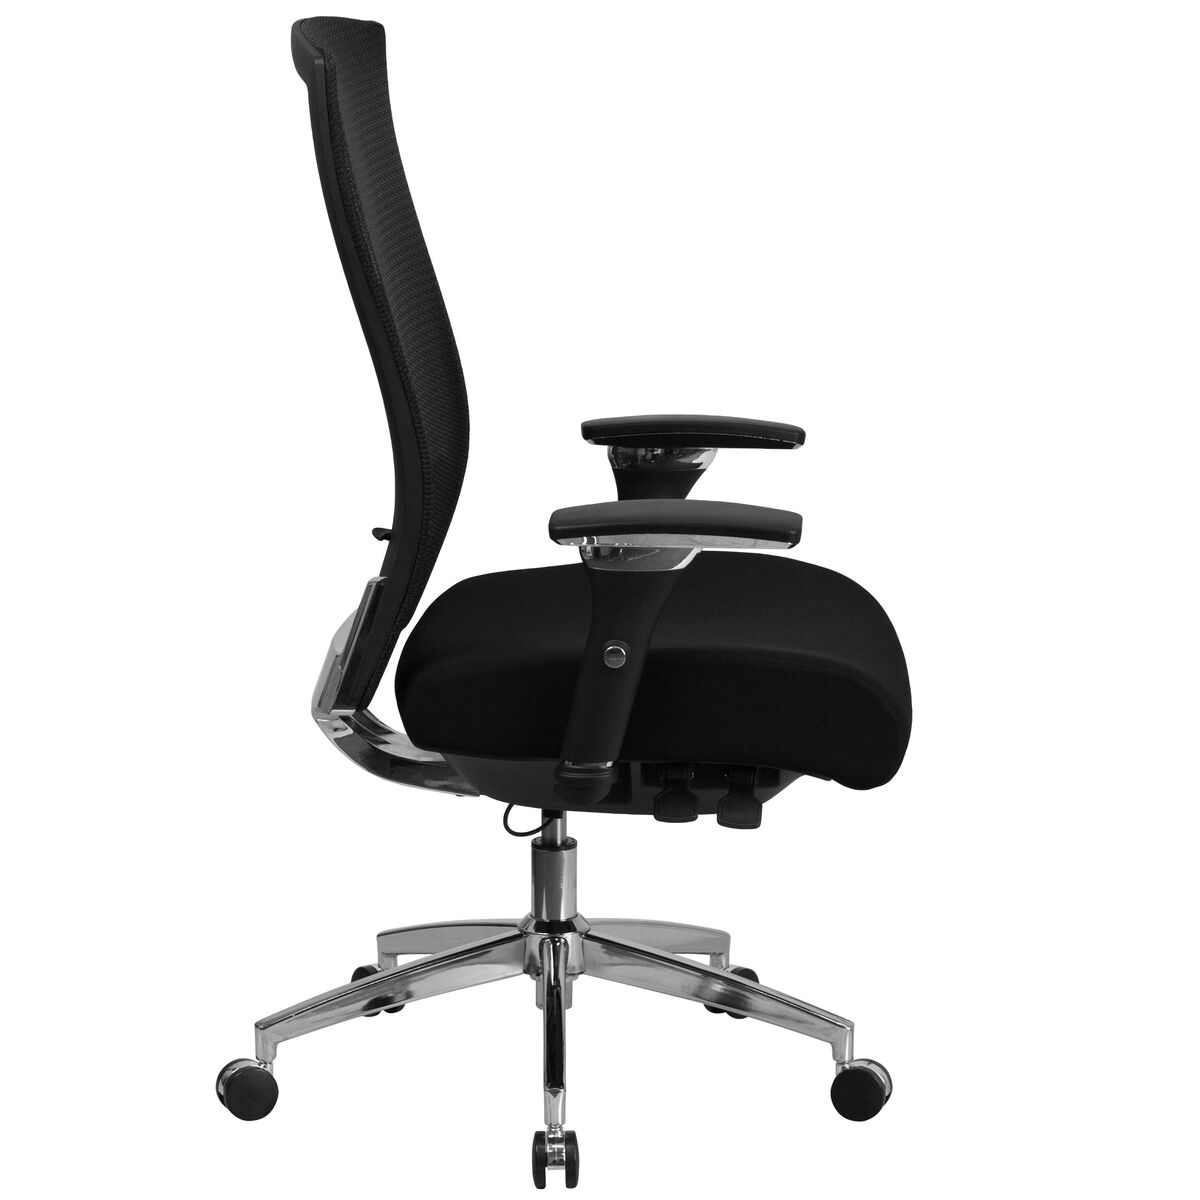 Strange Hercules Series 24 7 Intensive Use 300 Lb Rated Black Mesh Multifunction Ergonomic Office Chair With Seat Slider Ibusinesslaw Wood Chair Design Ideas Ibusinesslaworg